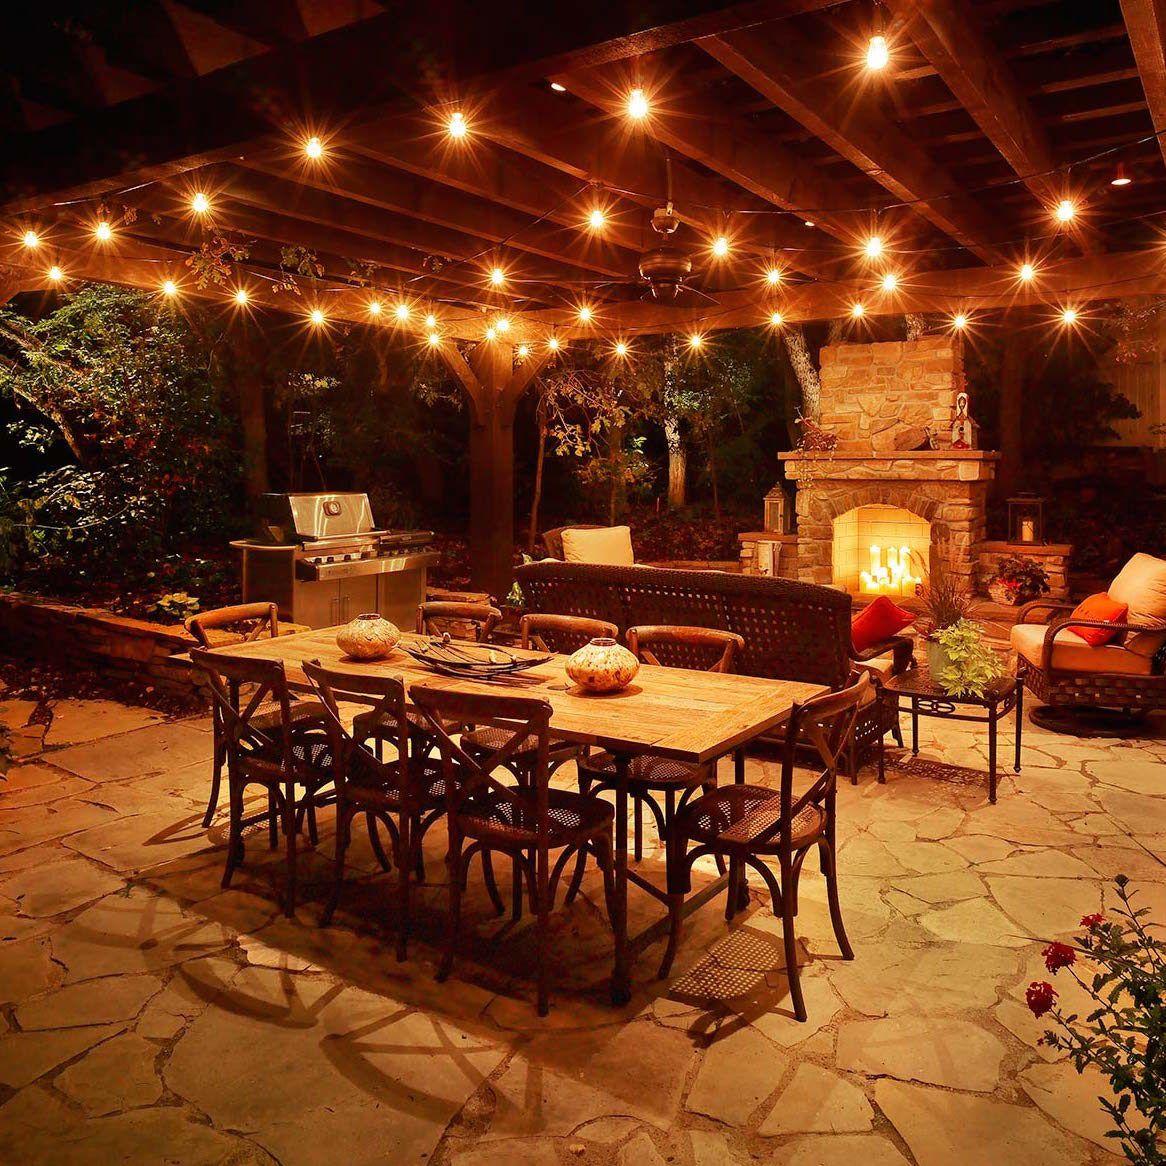 Cafe Bistro Lights: Ooh La La! - Yard Envy